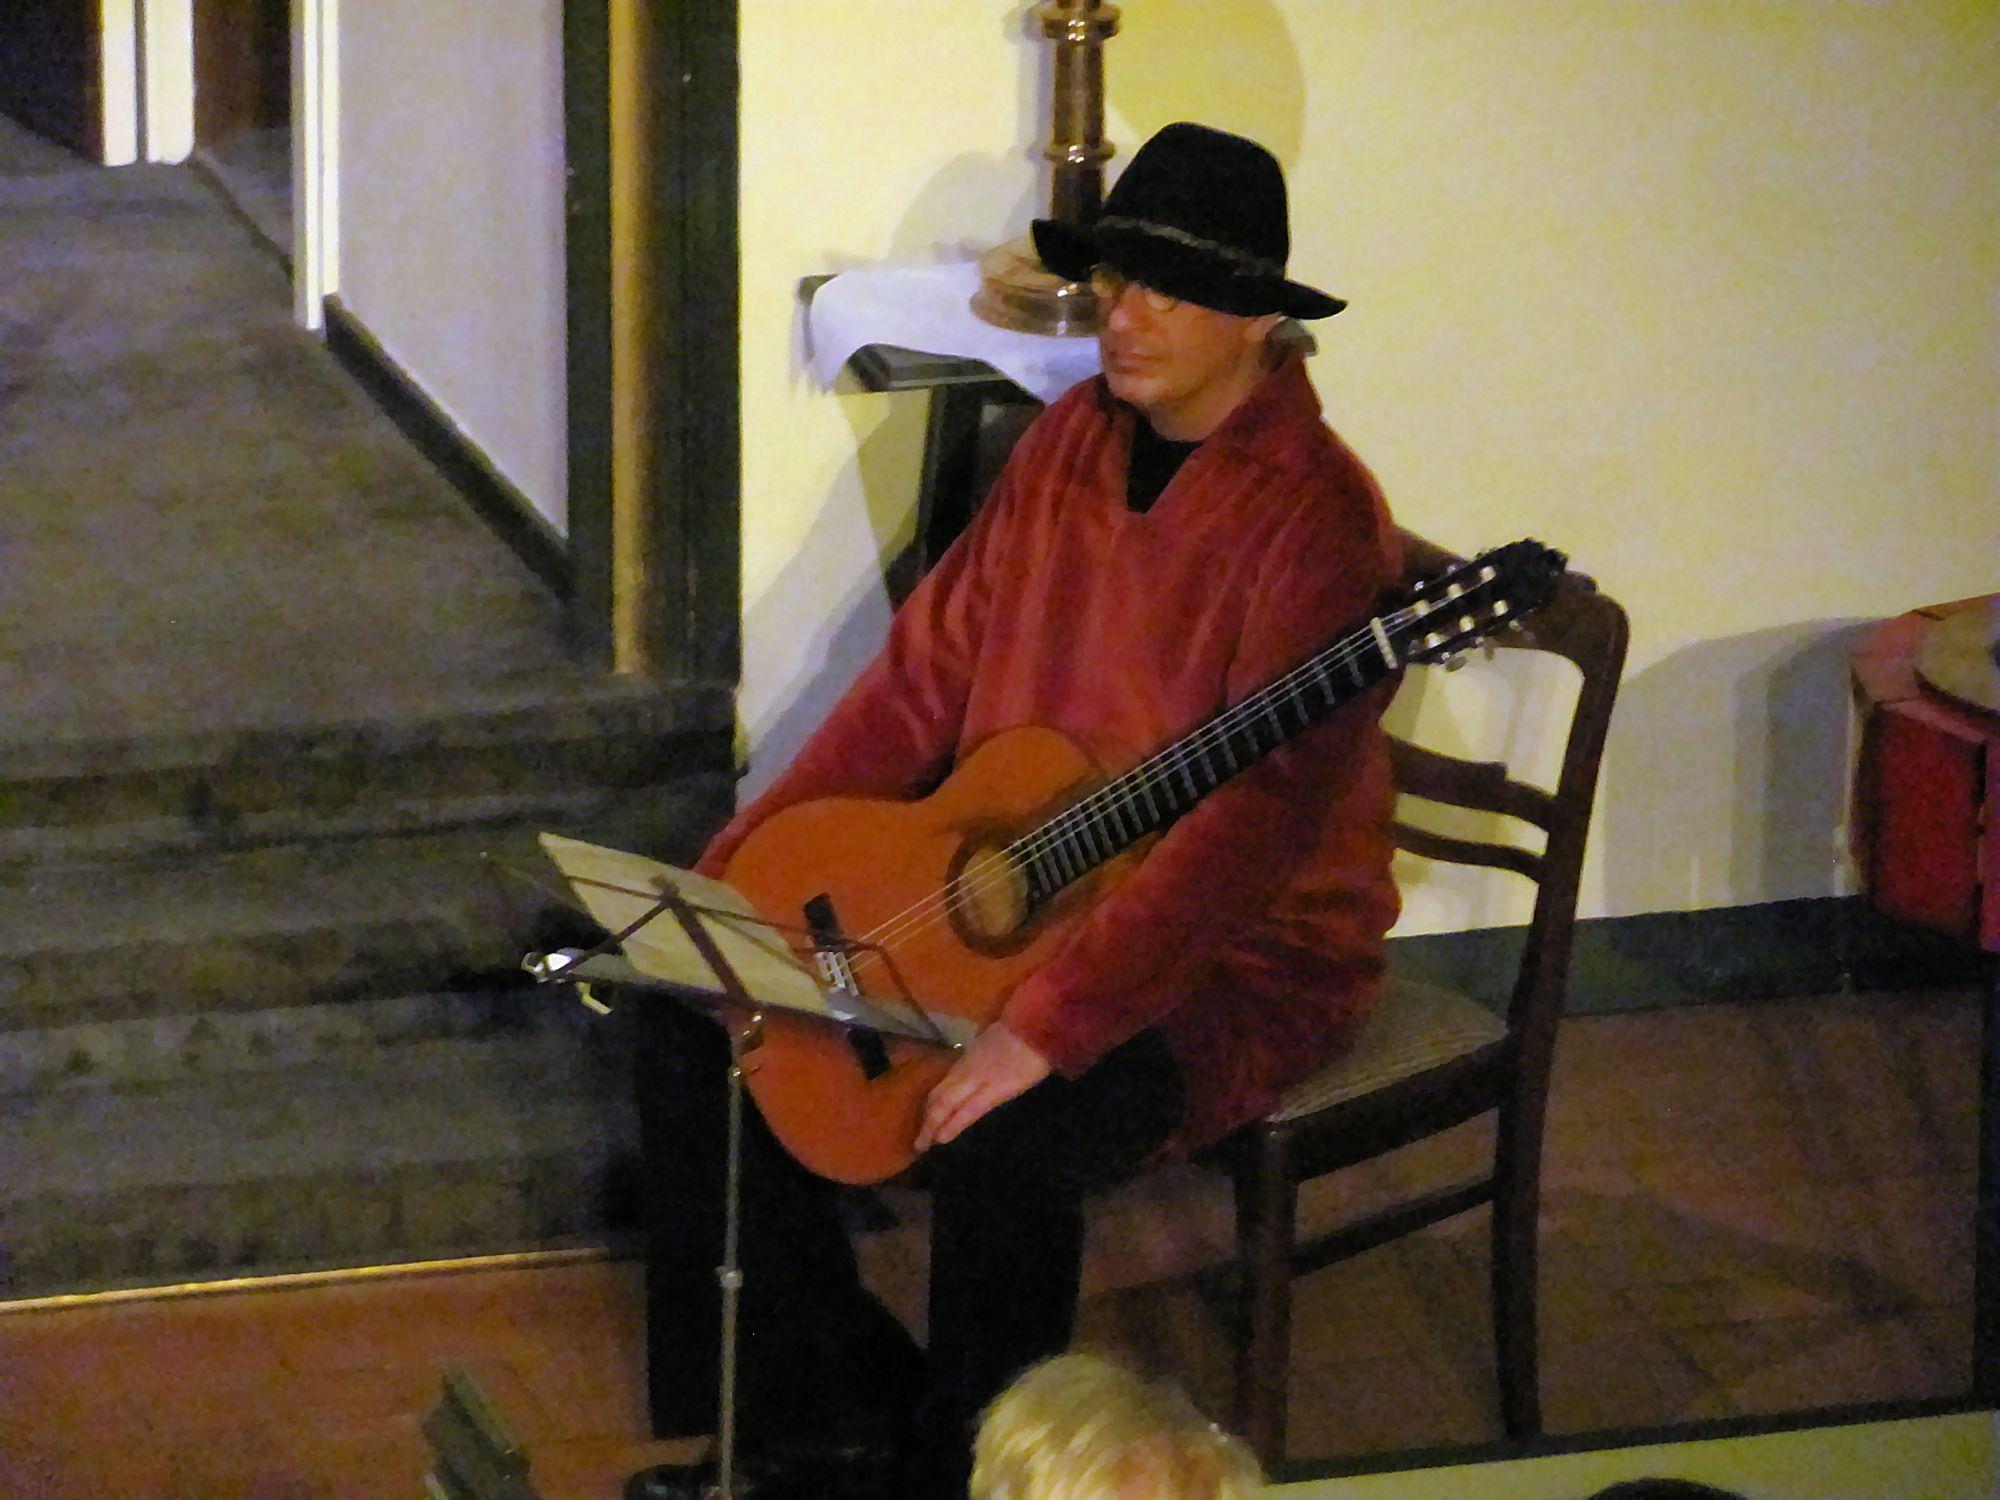 Gitarre: David Pampuch